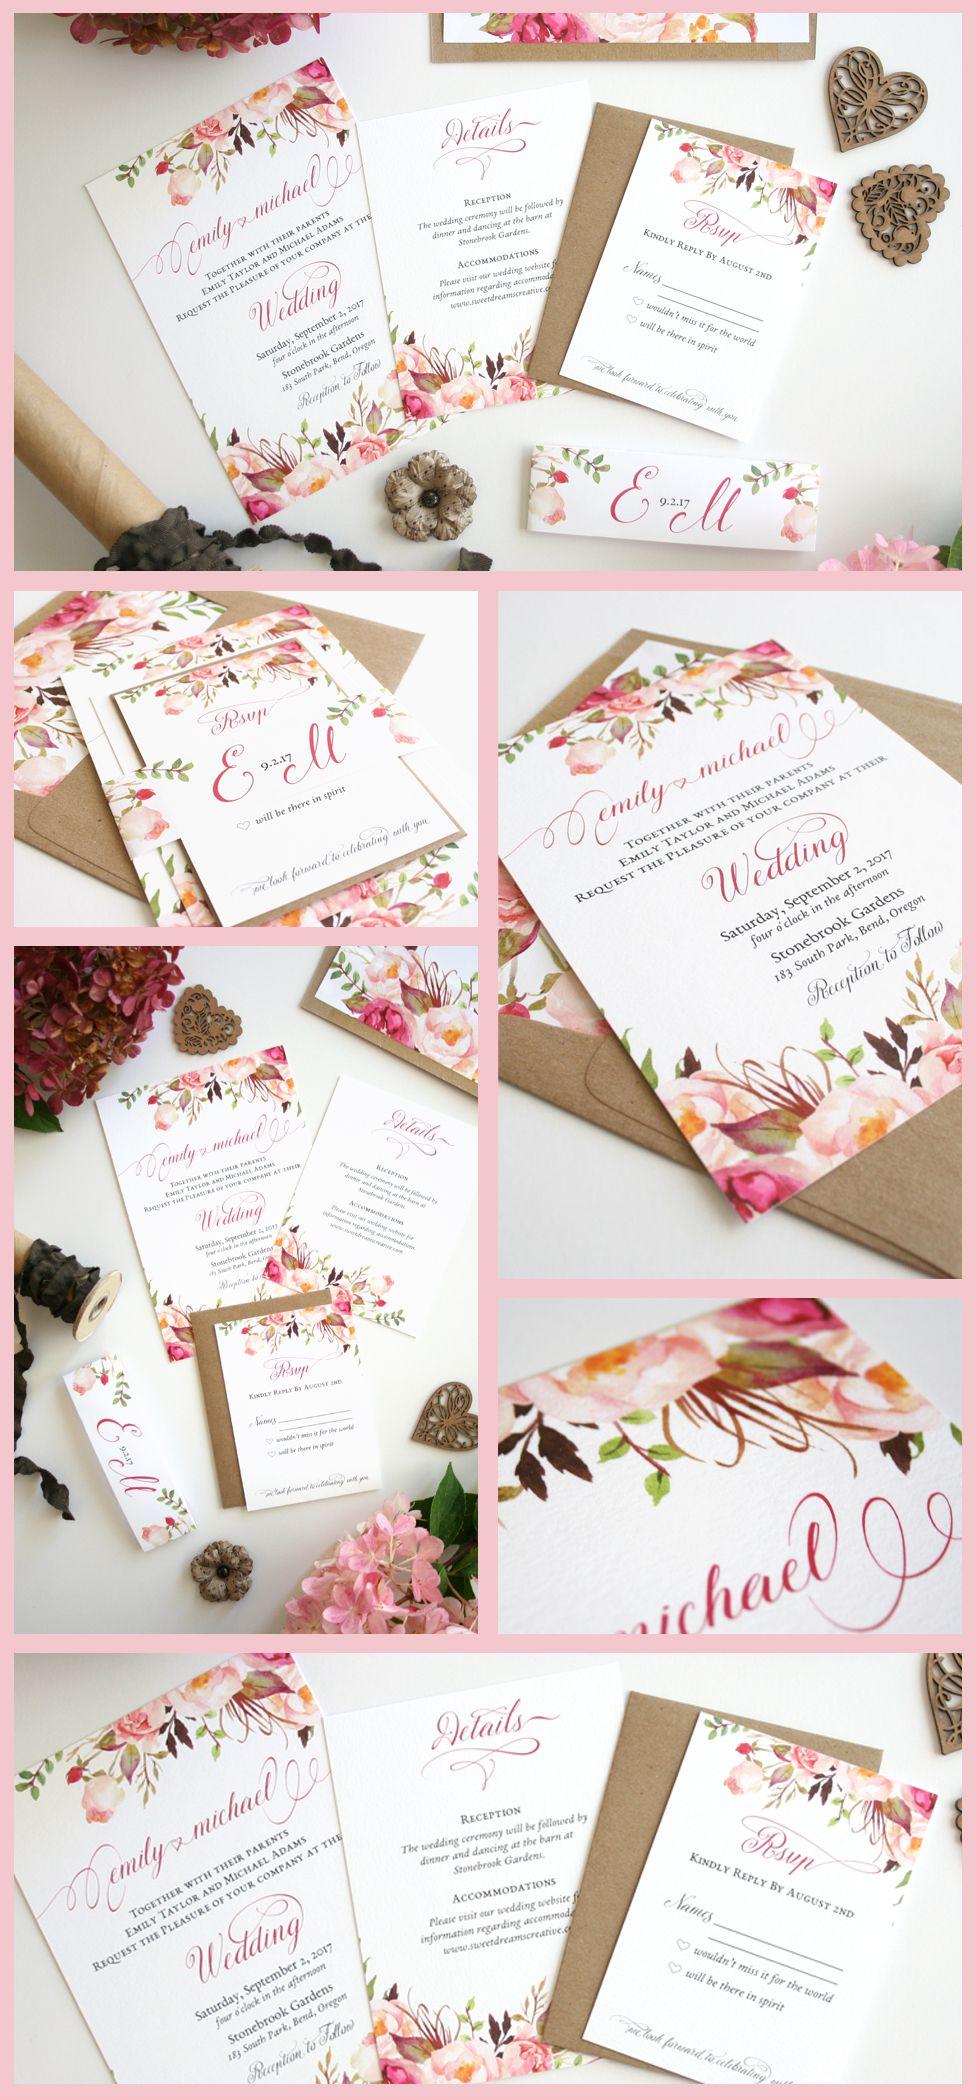 tulip wedding invitation templates%0A Floral Wedding Invitations  Blush Pink  Wedding Invitations  Rustic  Romance Script Collection Sample Set